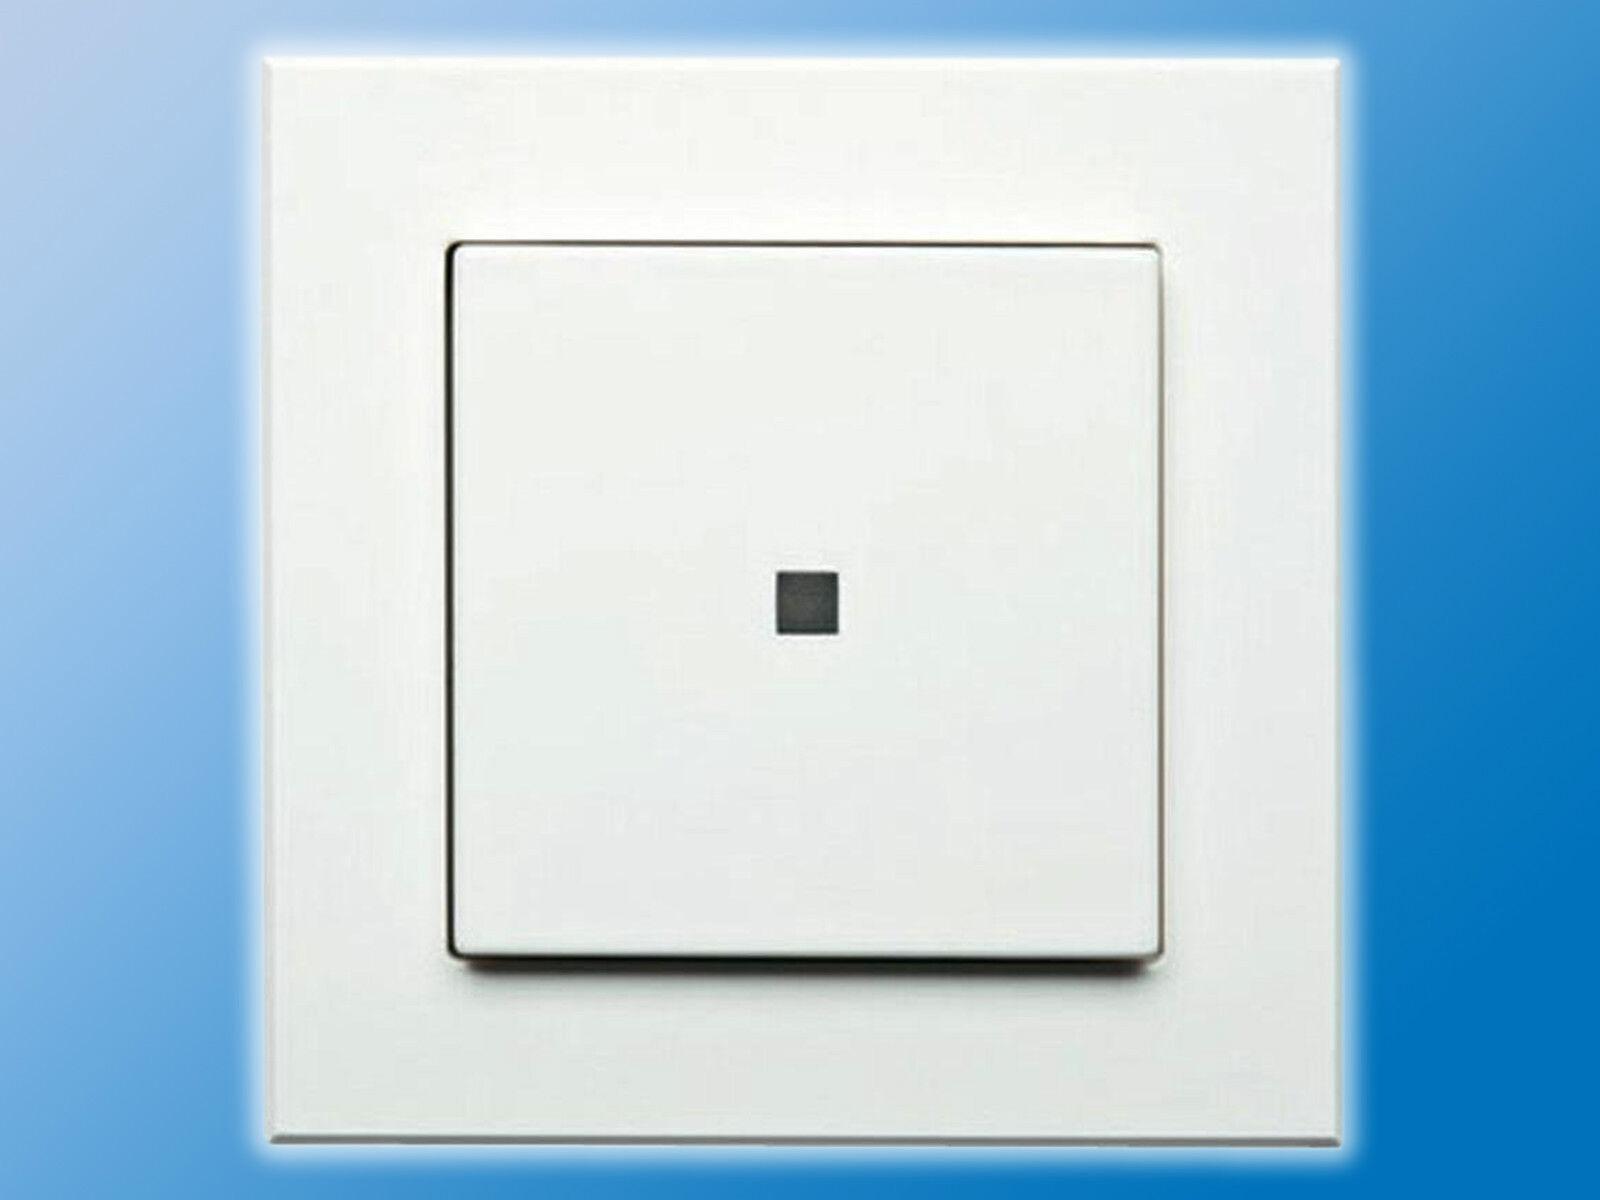 HomeMatic Funk Wandsender für Smart Home | HM-PB-2-WM55-2 | Weiß | -FERTIGGERÄT-